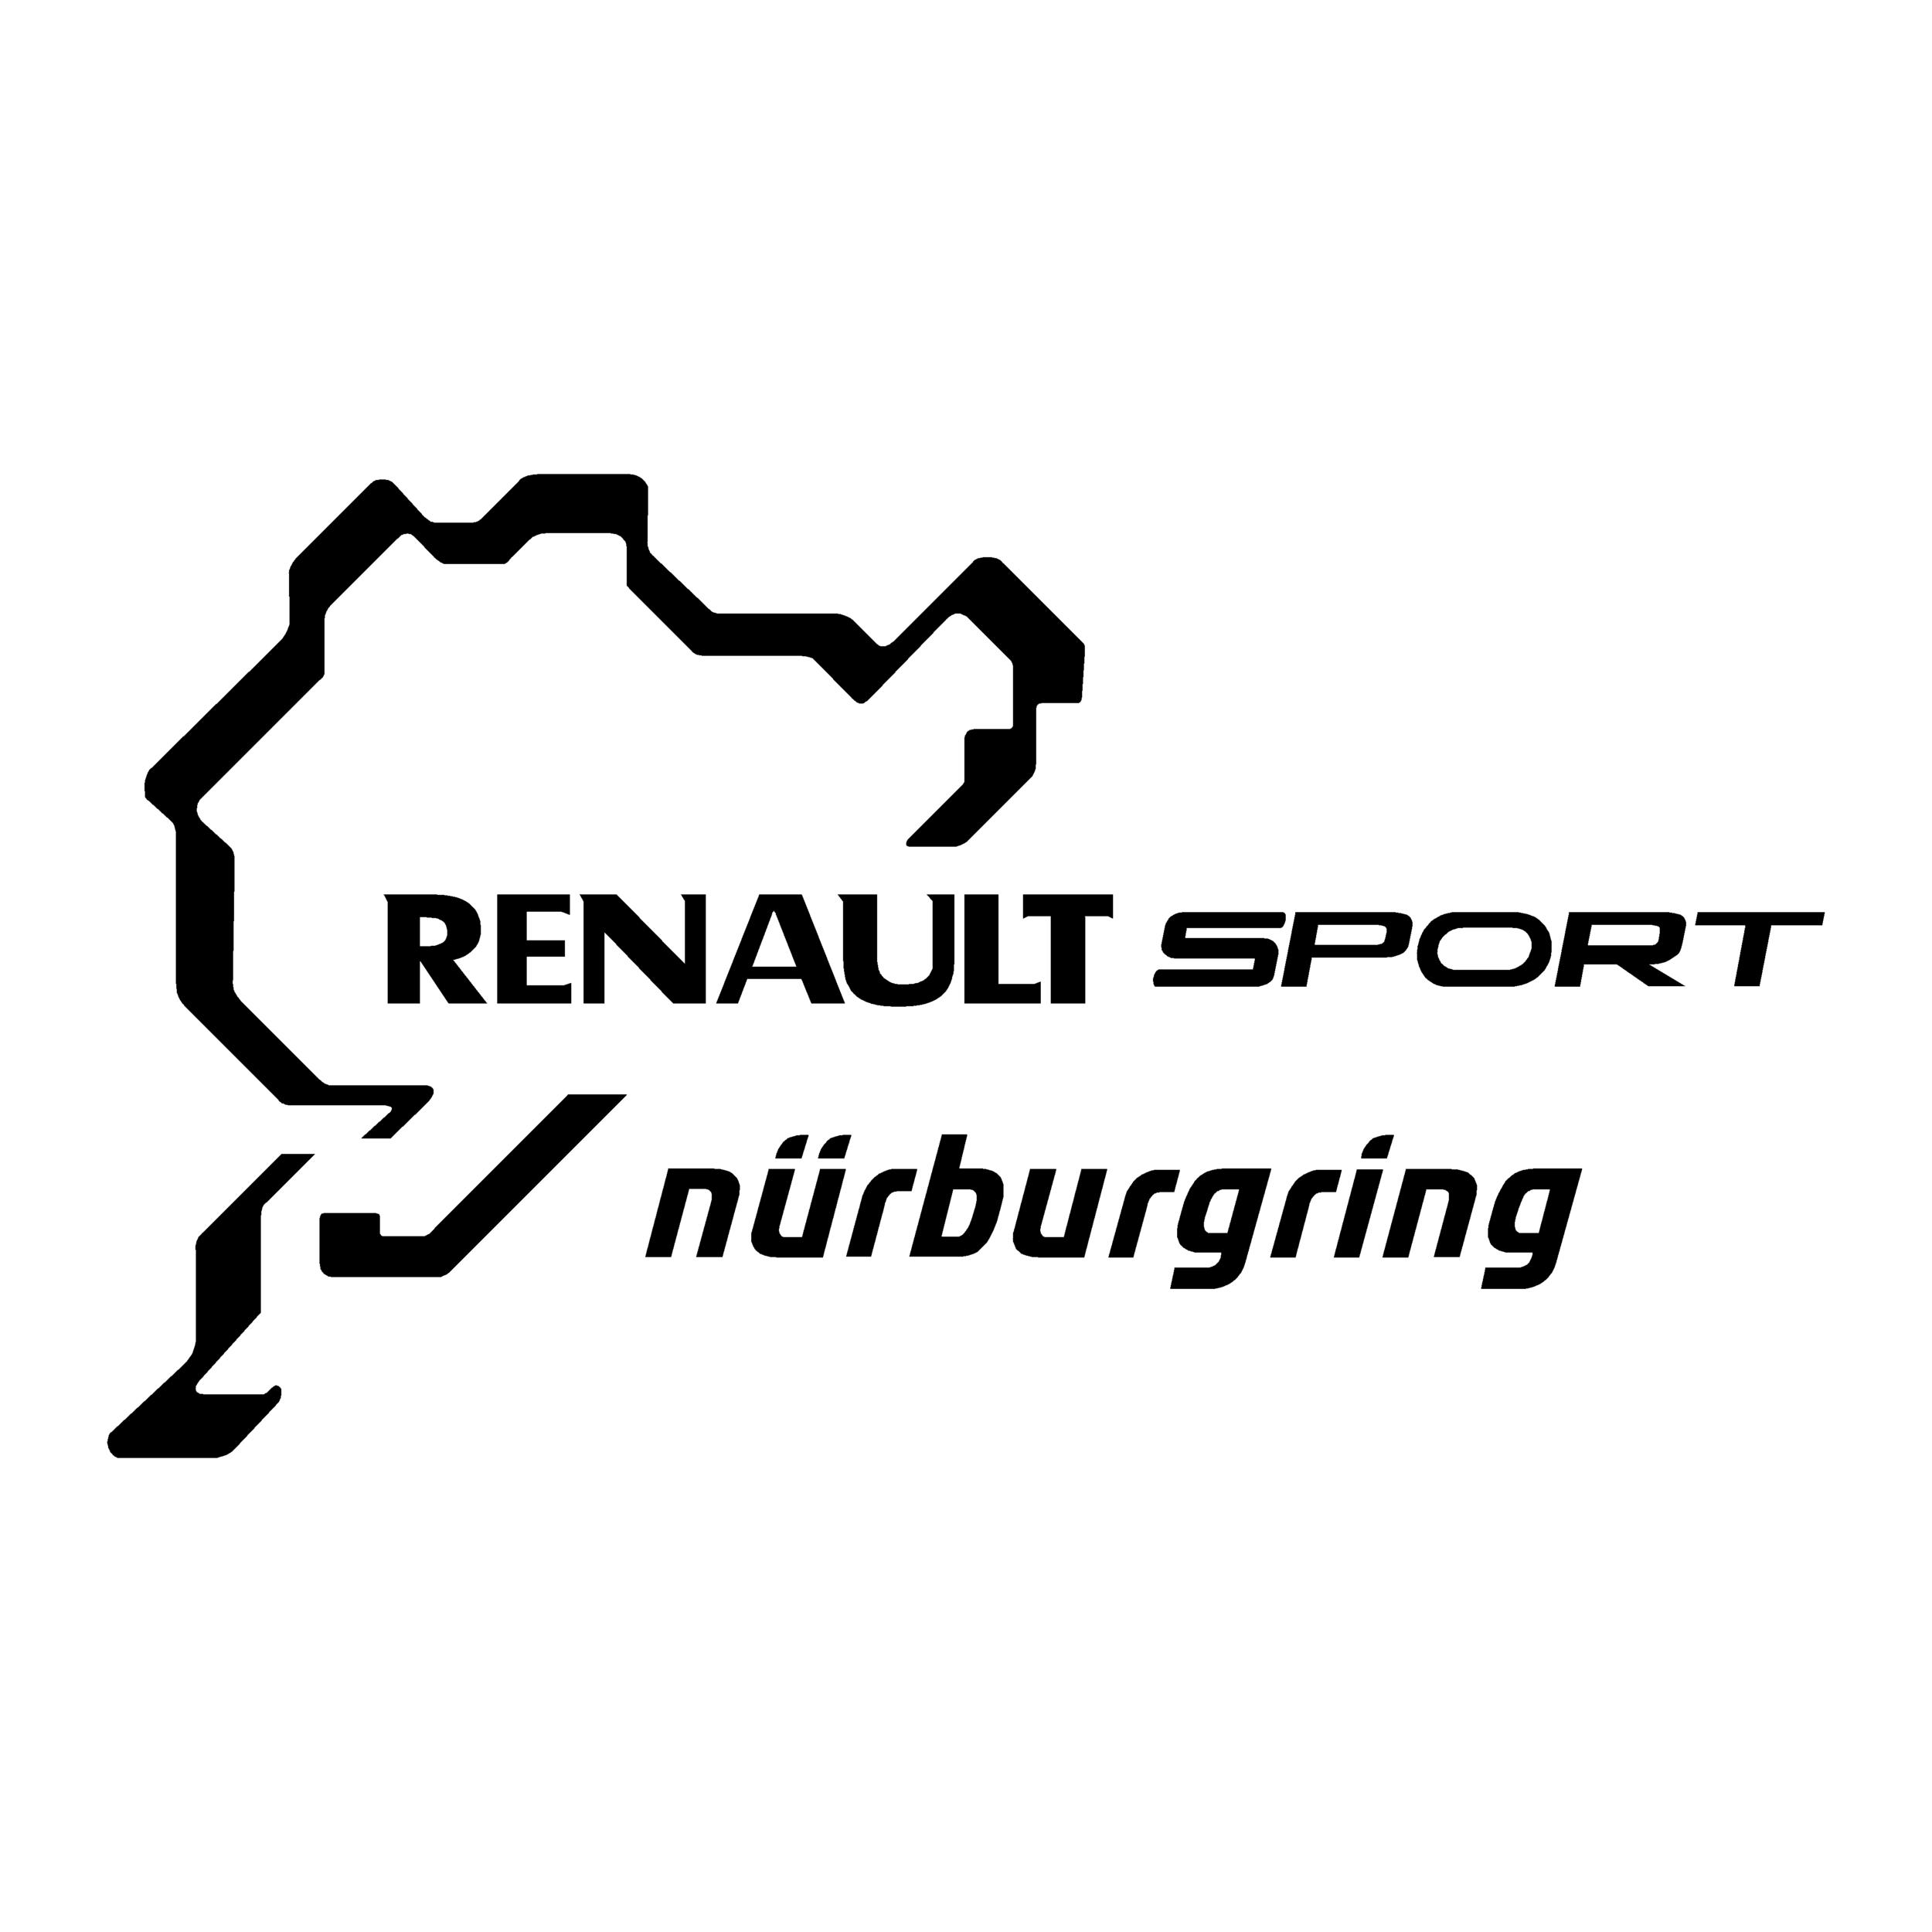 STICKERS NURBURGRING RENAULT